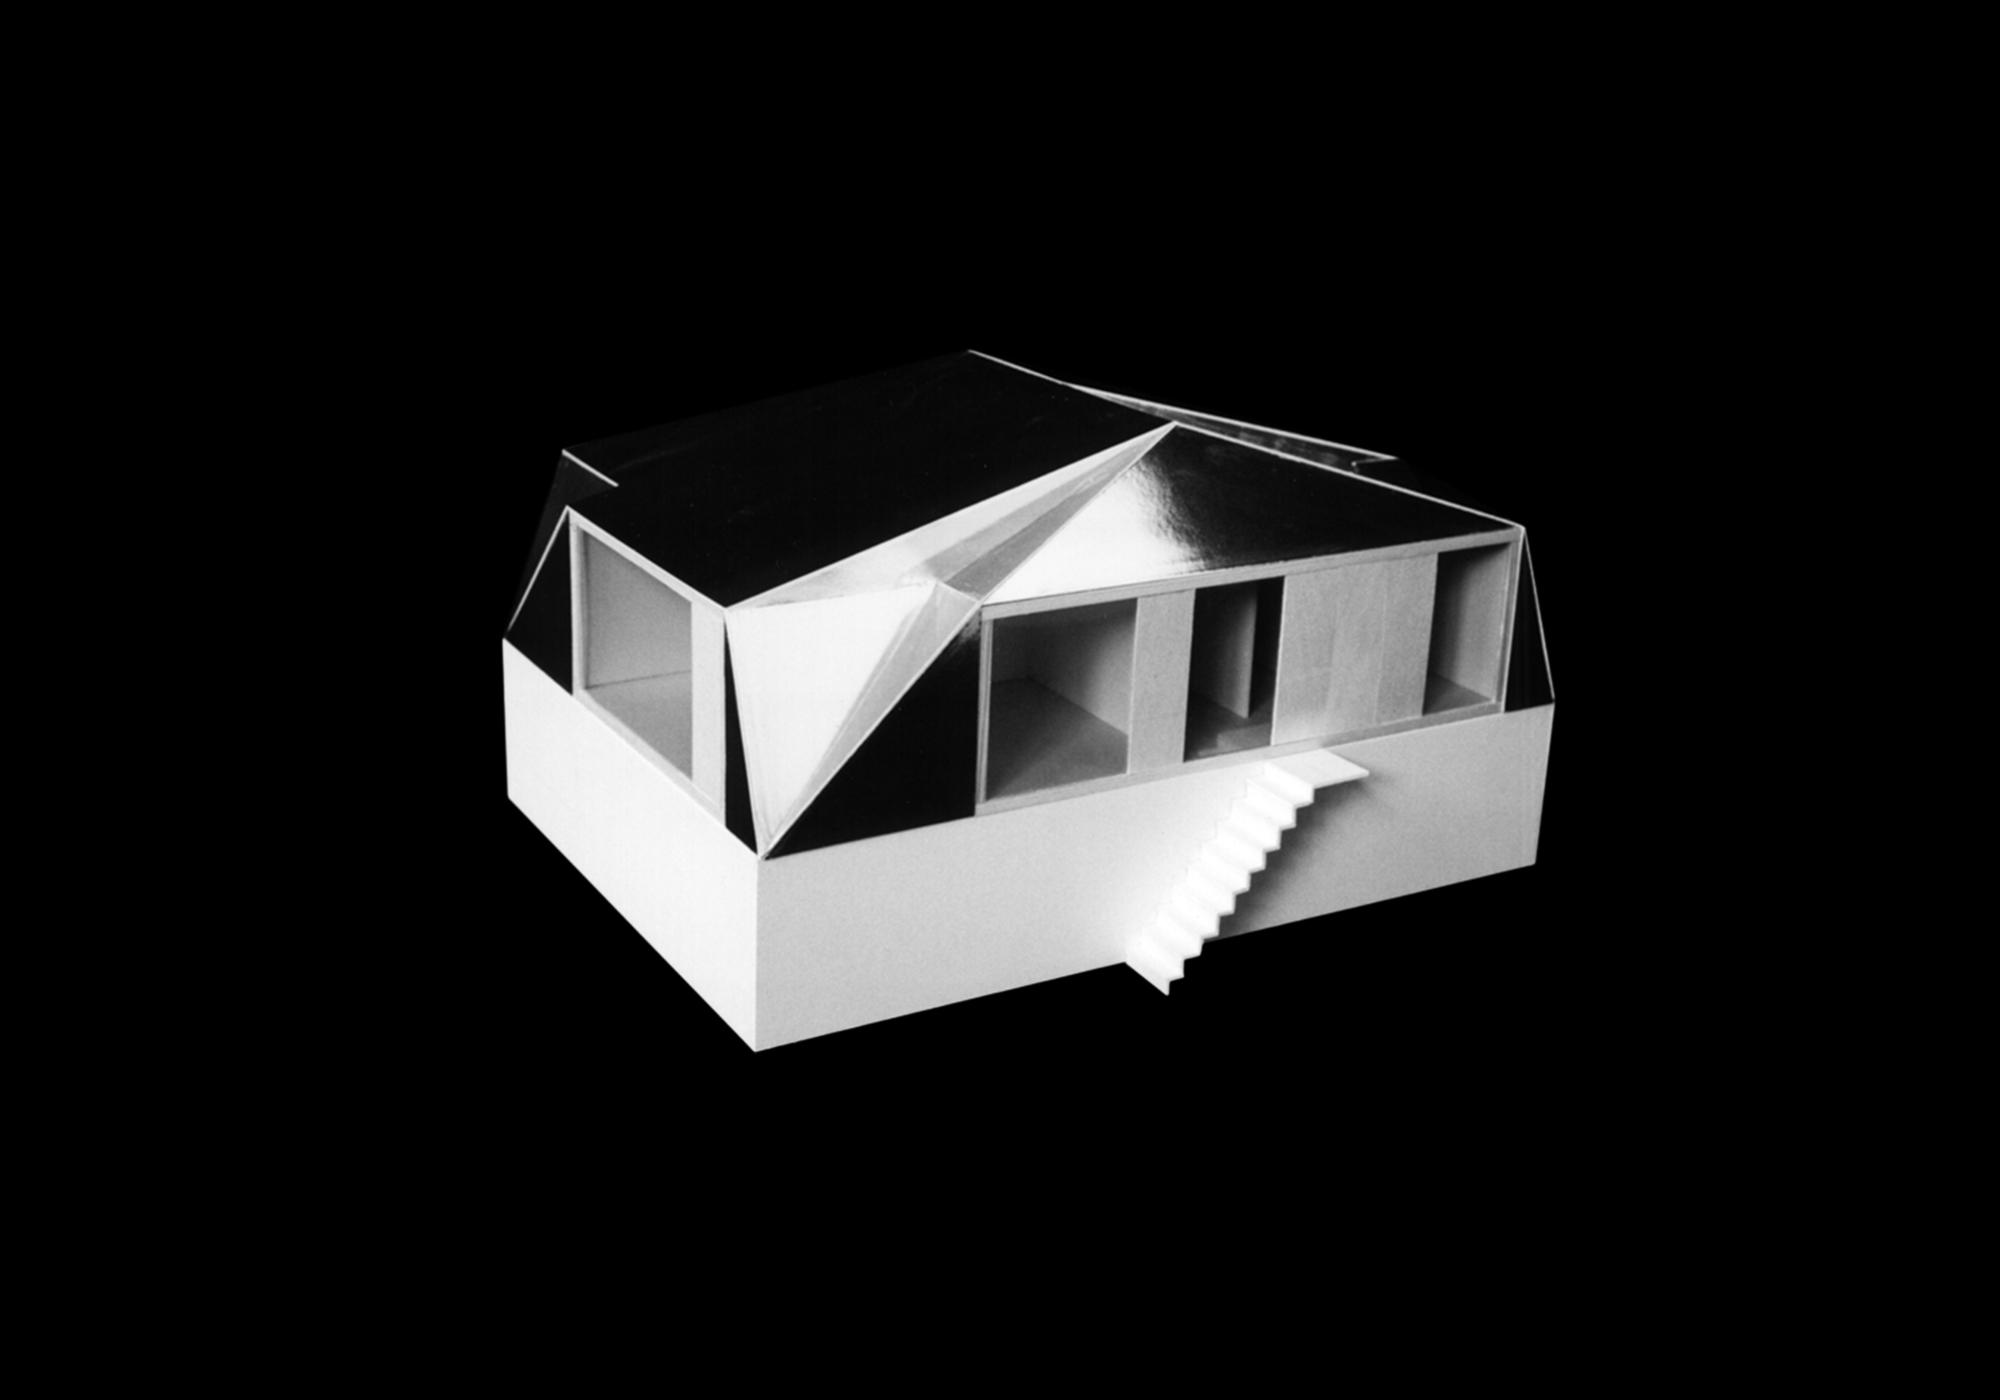 011 05 Lupsingen MM Modell 2 SCHWARZ NEU web